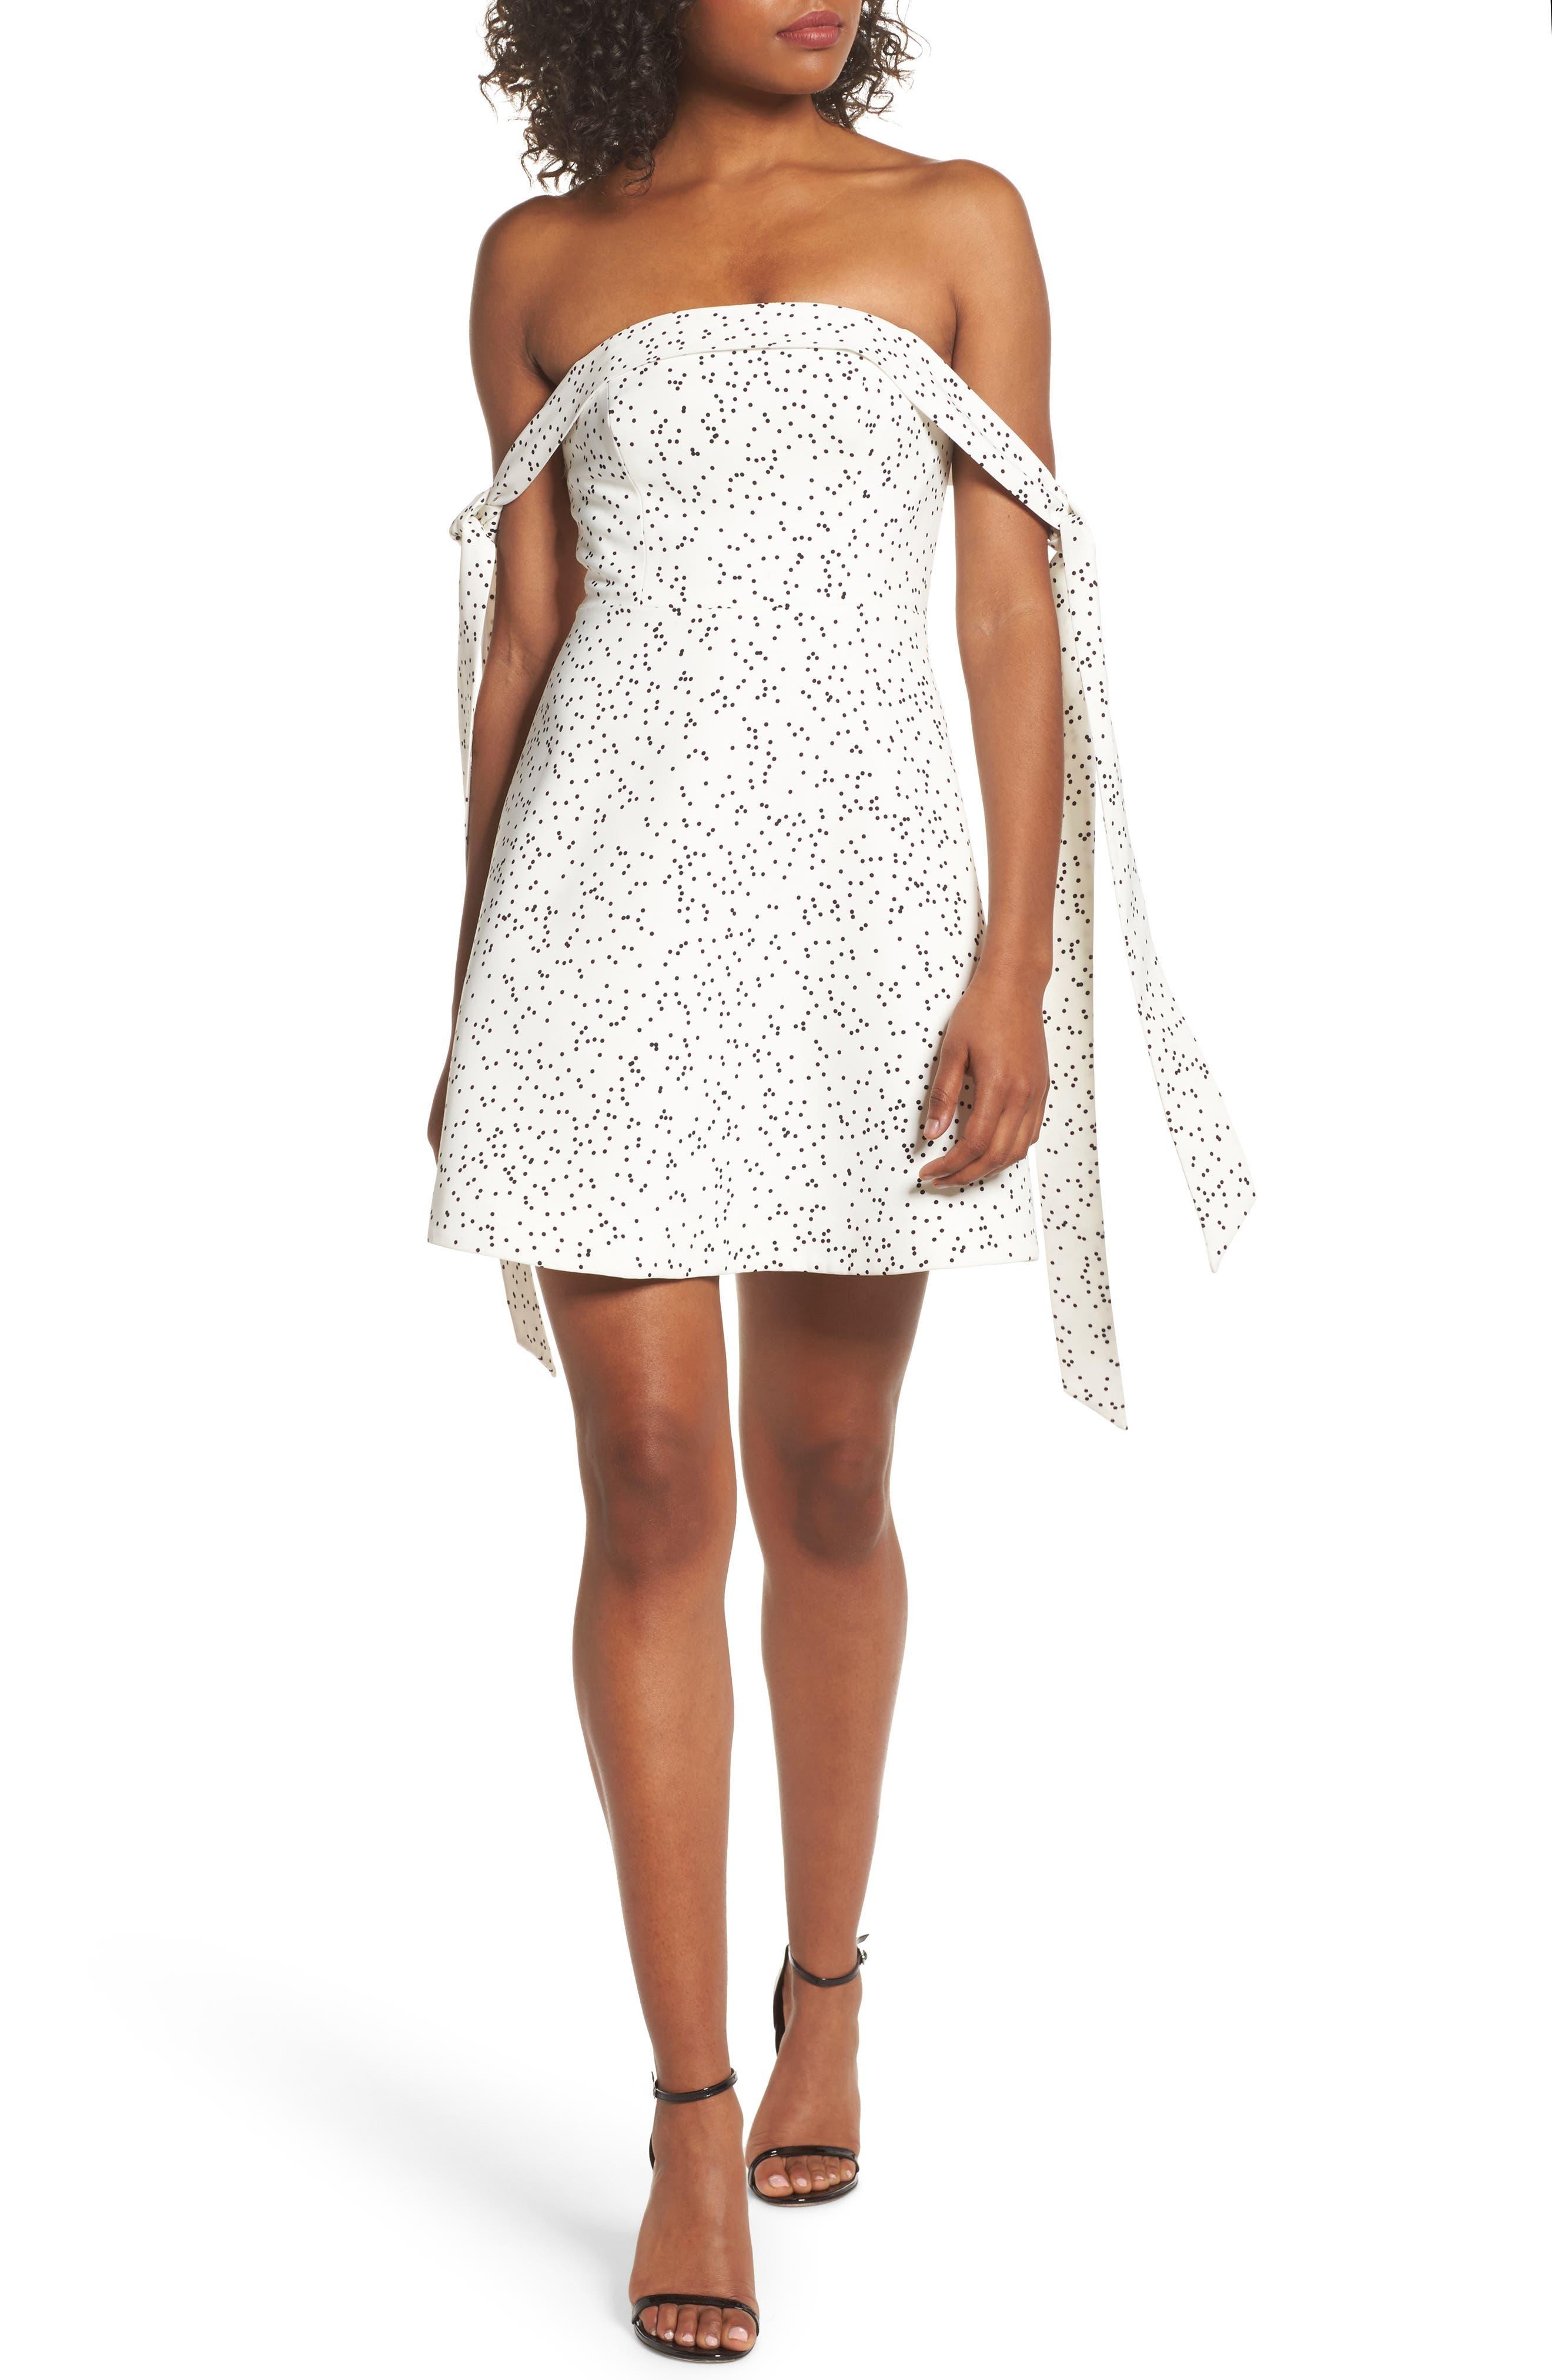 Embrace Me Off the Shoulder Dress,                         Main,                         color, White W Black Spot